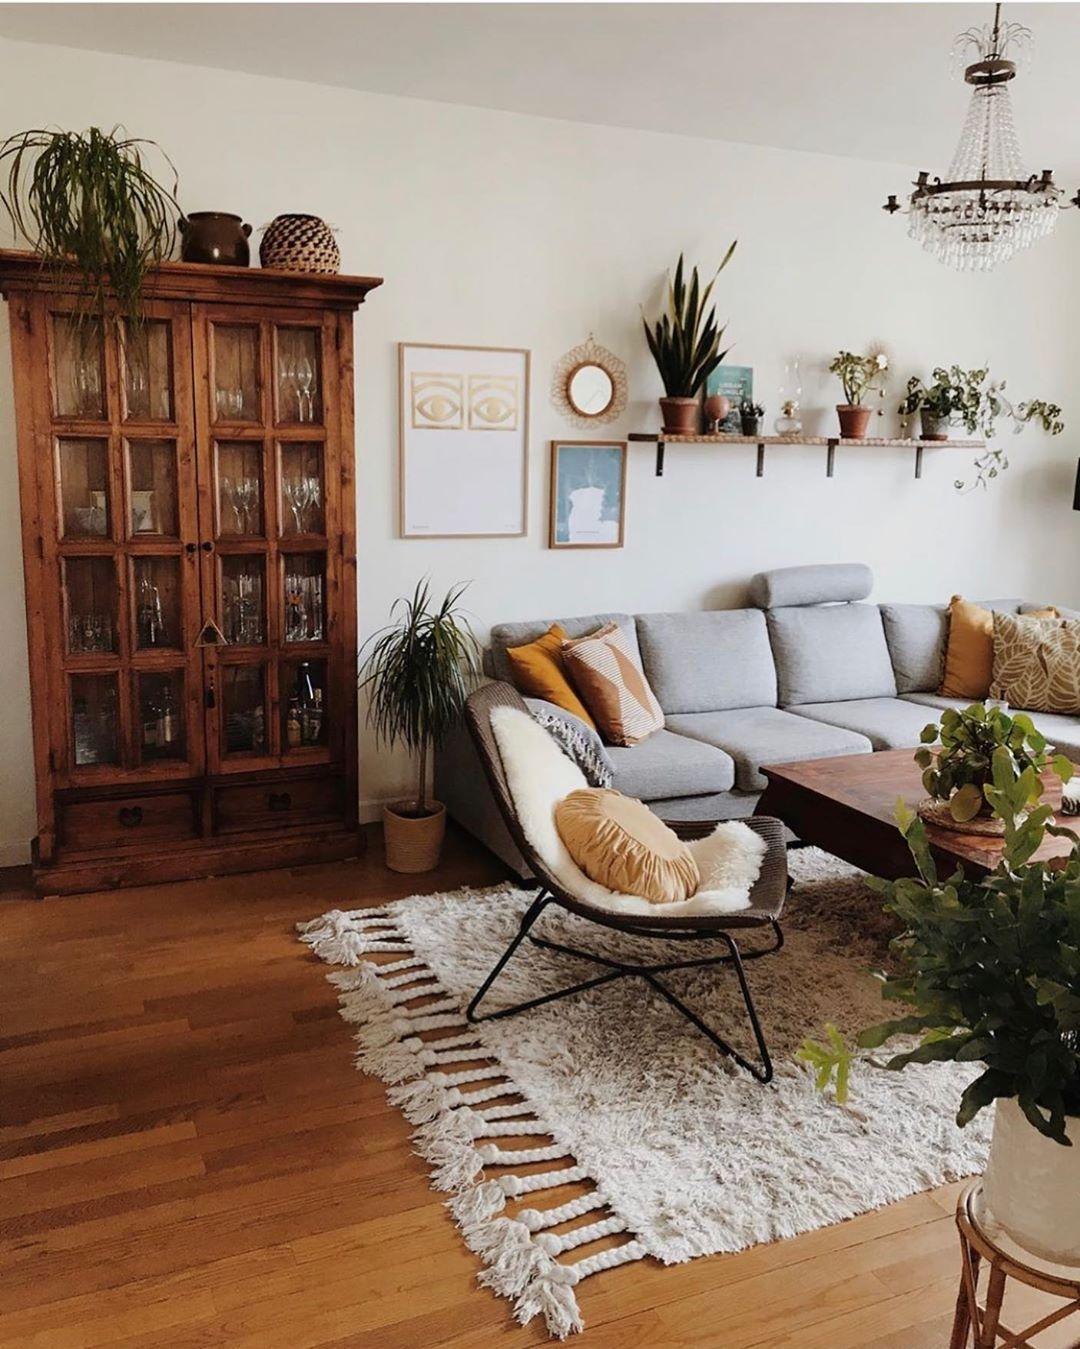 Home Is Where The Plants Are Shellenasellsatlanta Atlantarealestateagent Atlanta Real Living Room Scandinavian Living Room Designs Living Room Inspiration